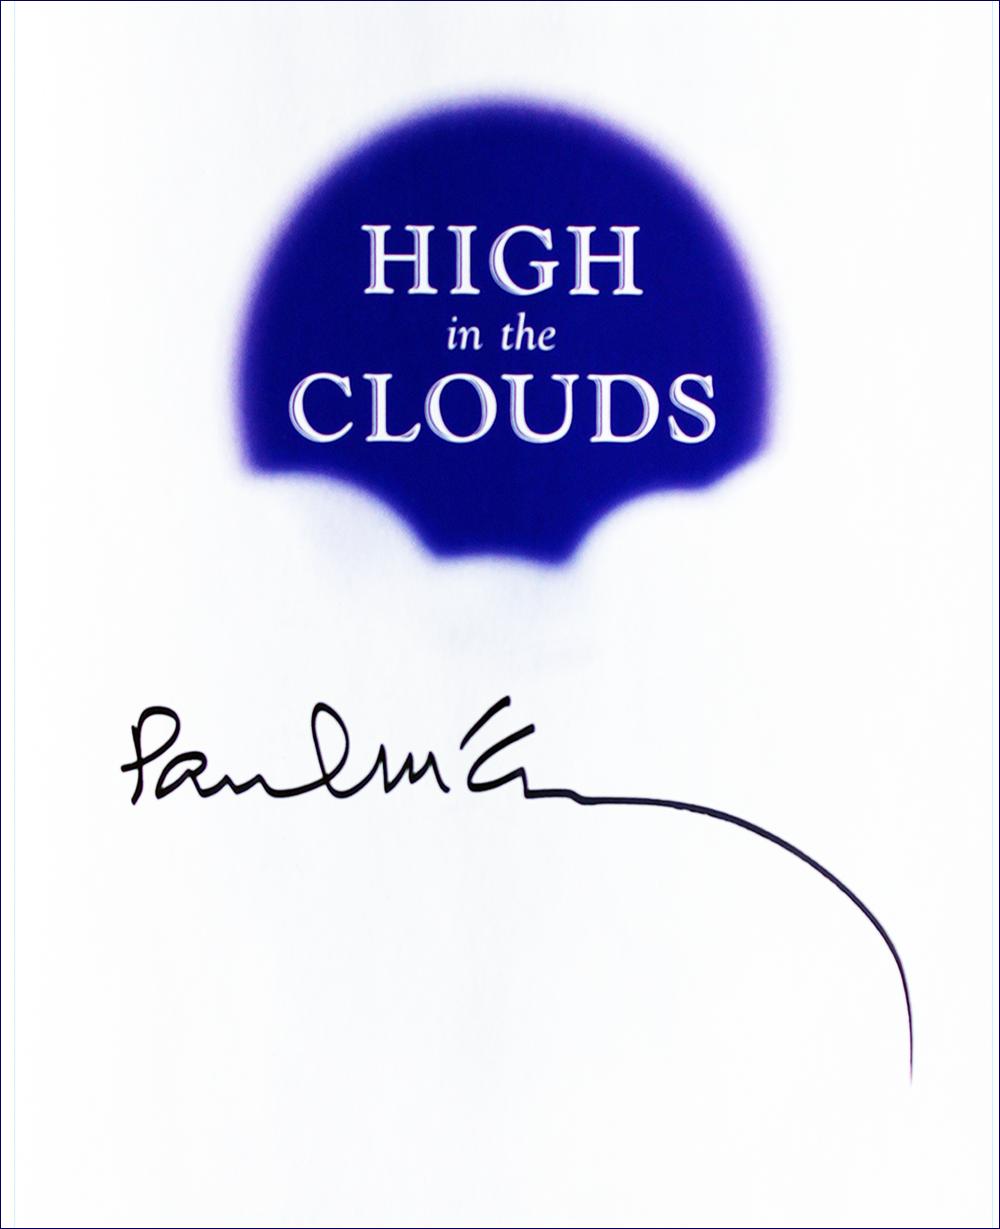 Book - High in the Clouds - Paul McCartney - Inside #2